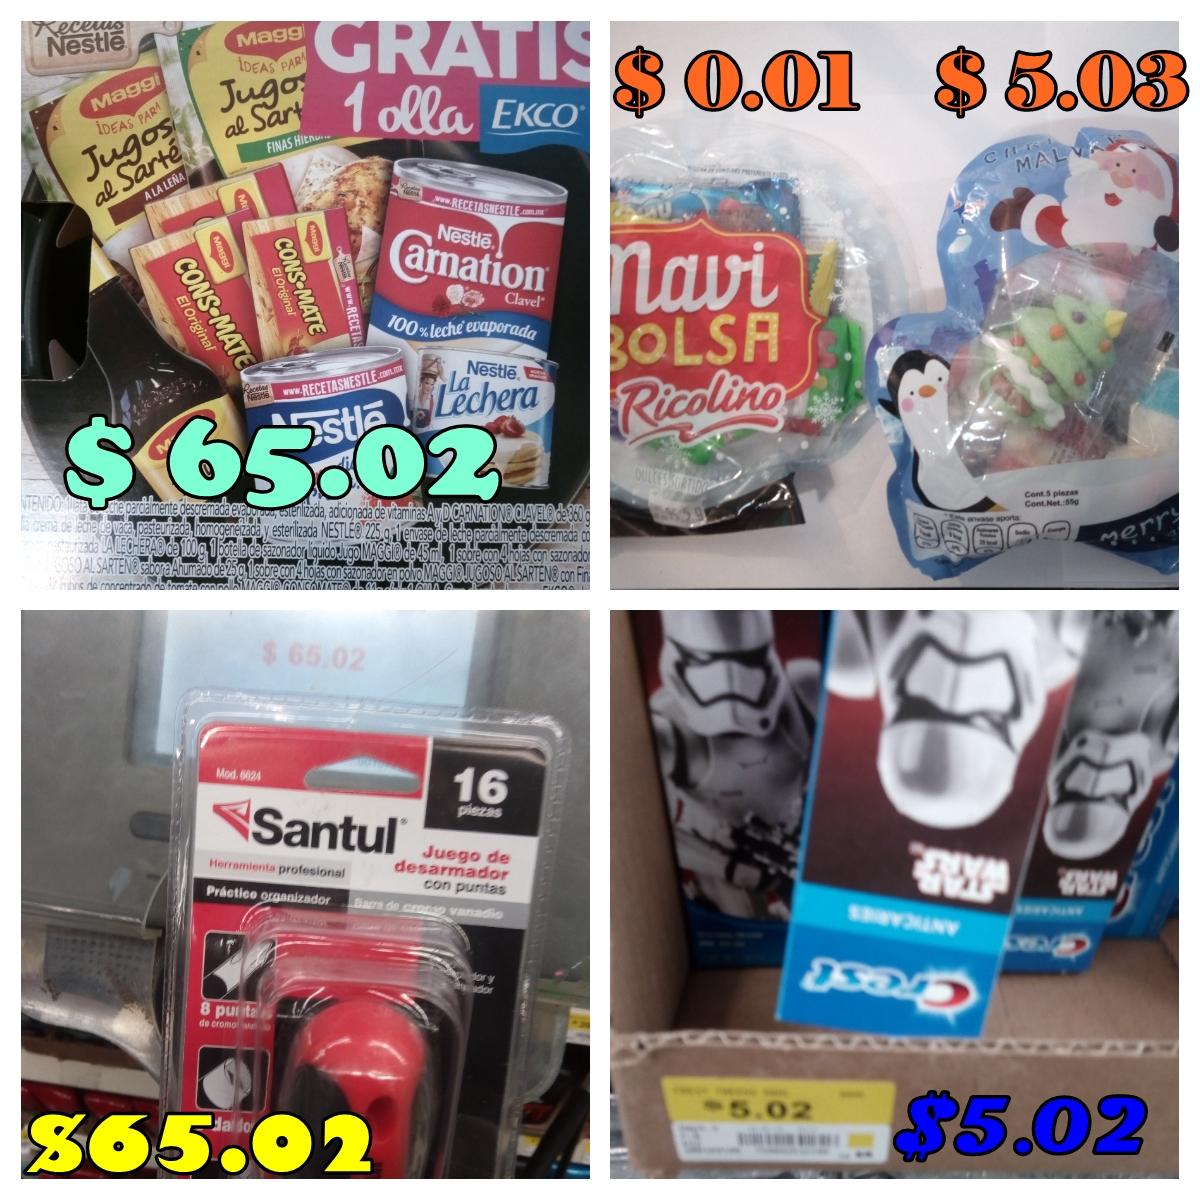 Bodega Aurrerá: Nestle pack + olla ekco $ 65.02 y más